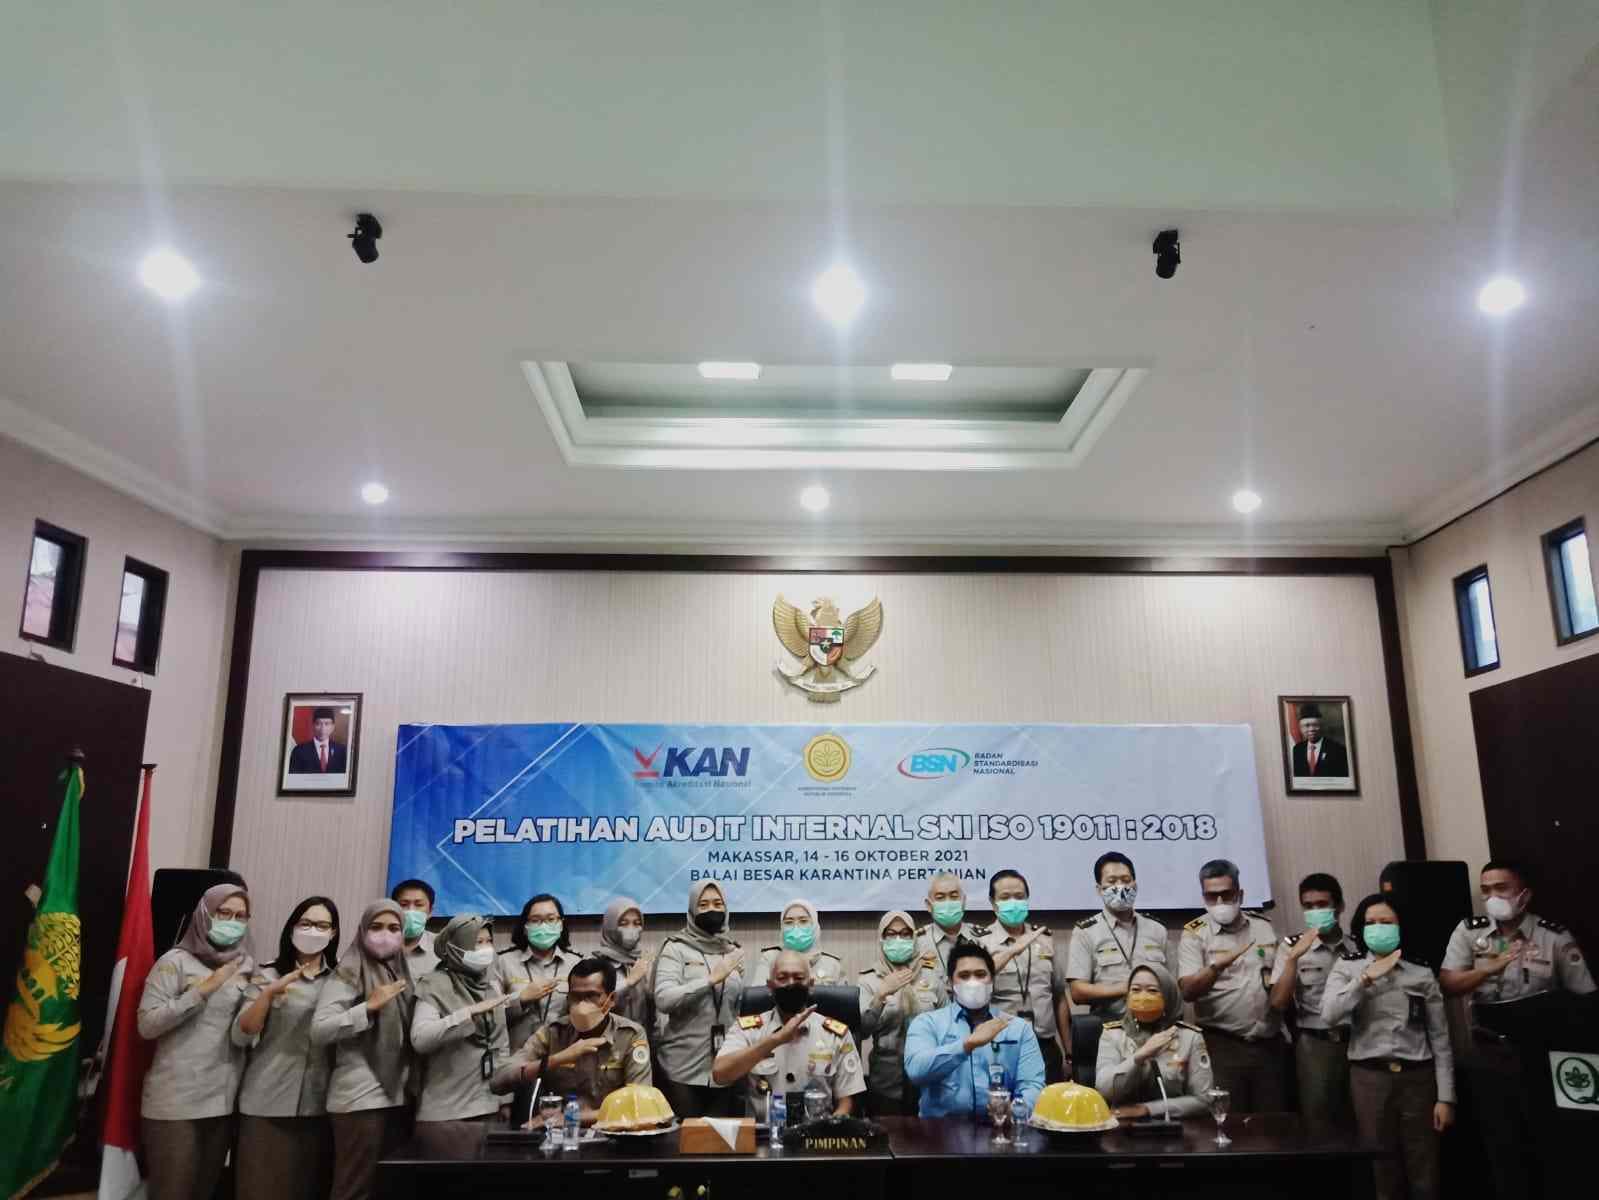 BBKP Makassar Gelar Pelatihan Griyaan Audit SNI ISO 19011 - 2018